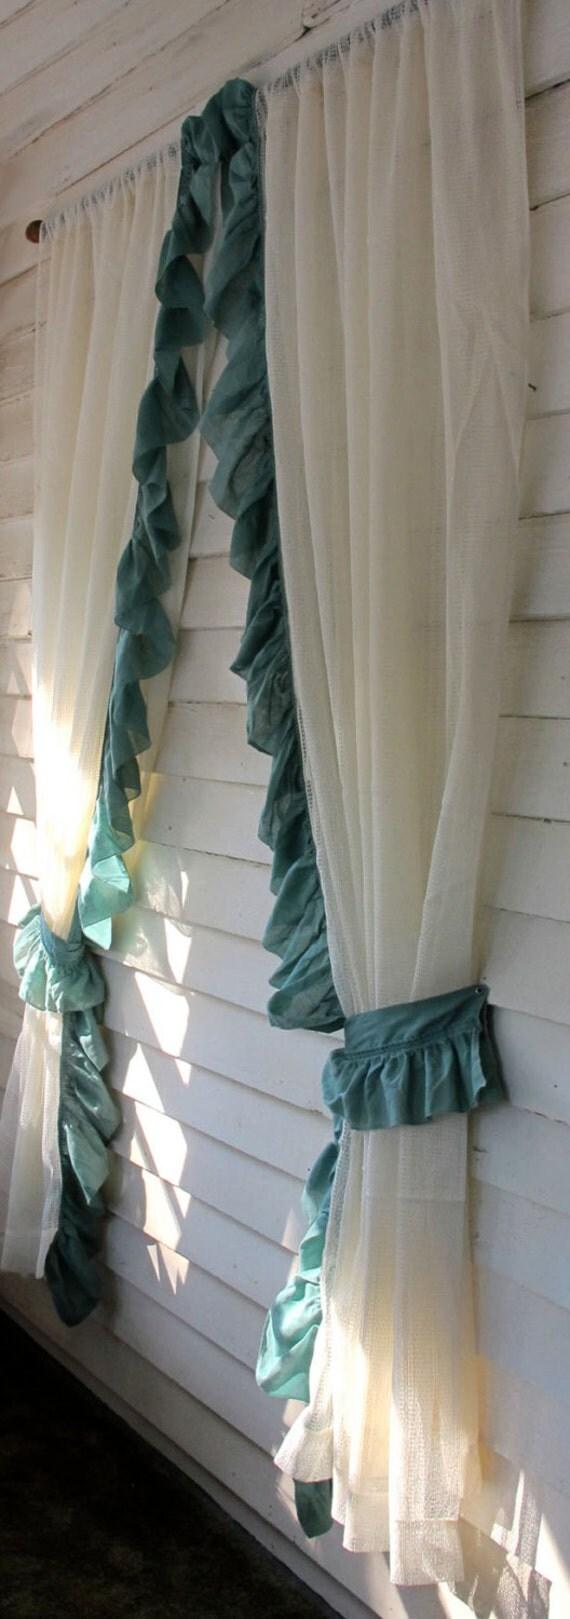 Ruffled Tieback Curtains Priscilla Drapes Lined Window